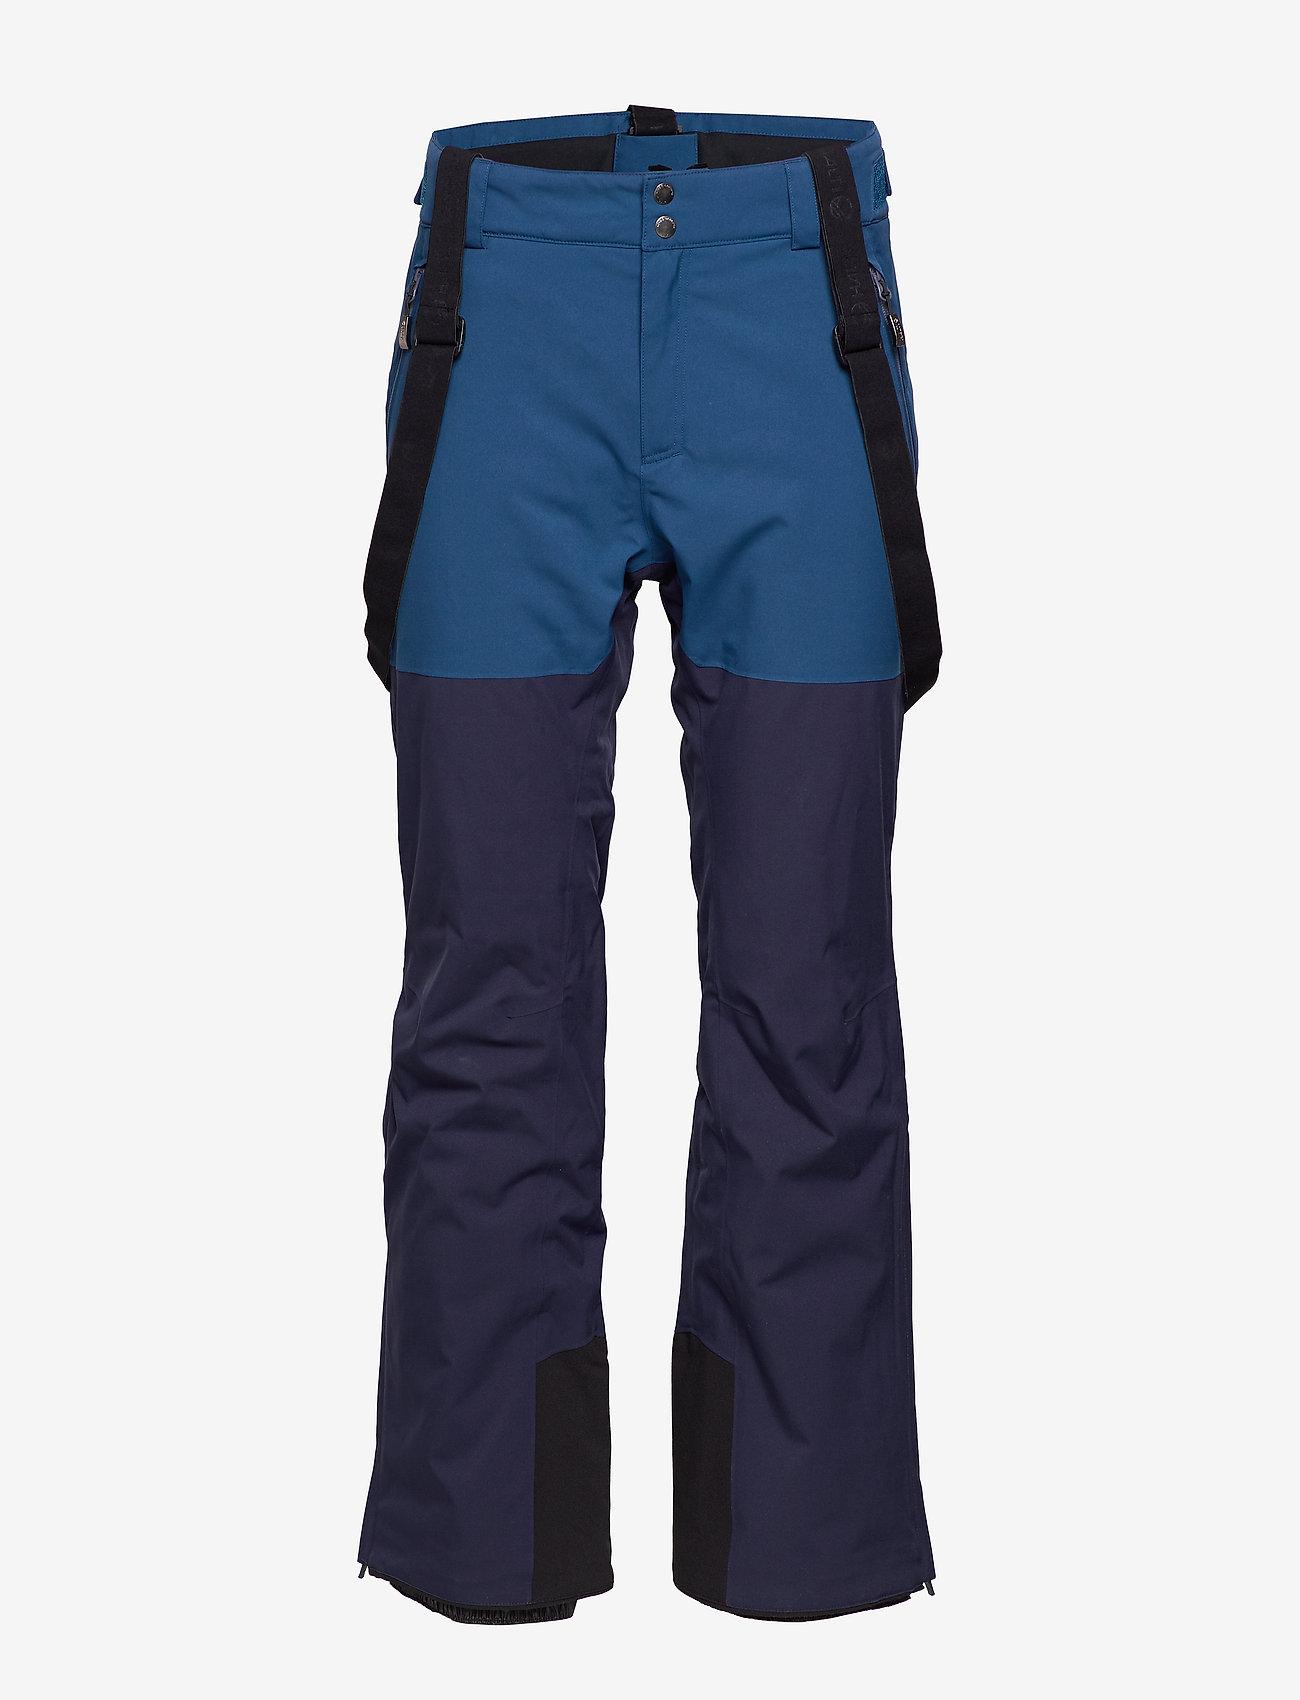 Halti - Podium II M Pants - insulated pantsinsulated pants - blue opal - 0